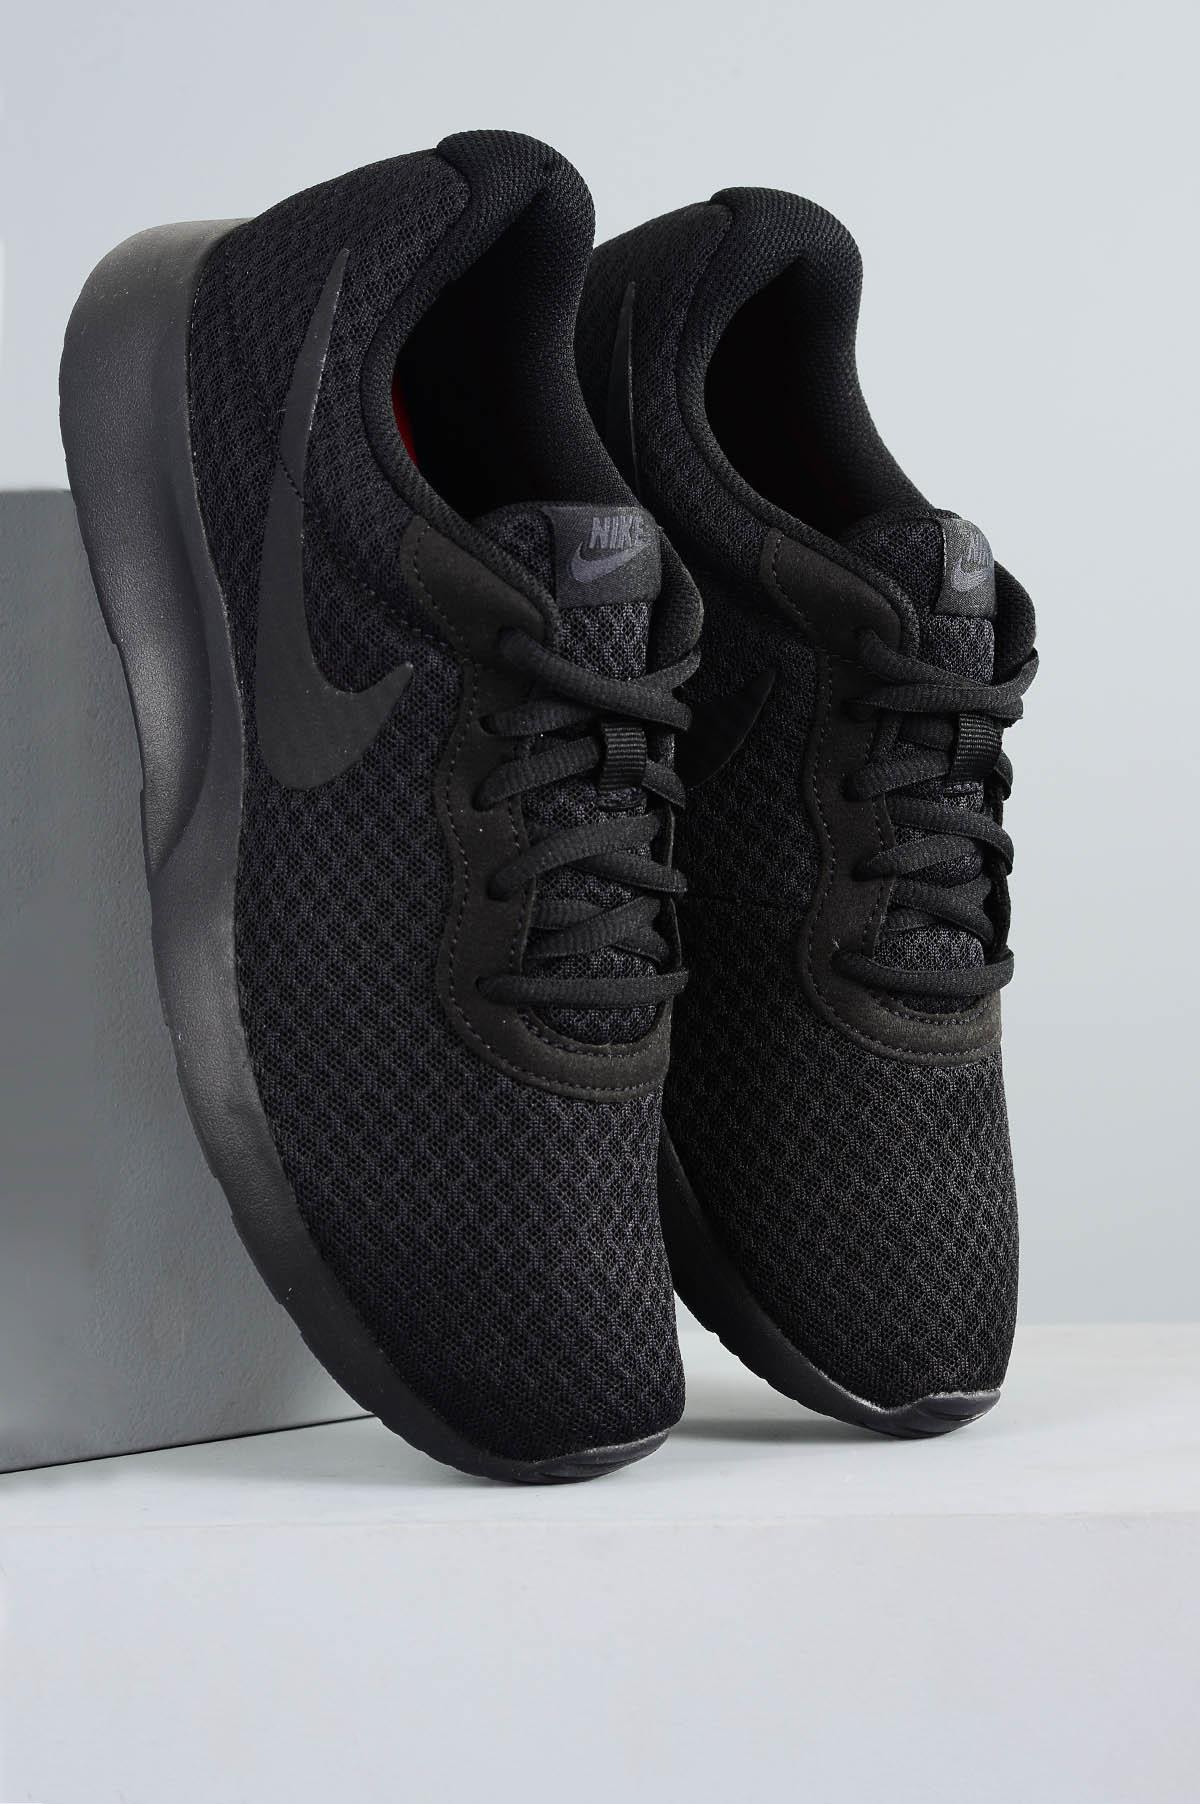 7bb1e4395 Tênis Masculino Nike Tanjun DIVERSOS - PRETO - Mundial Calçados